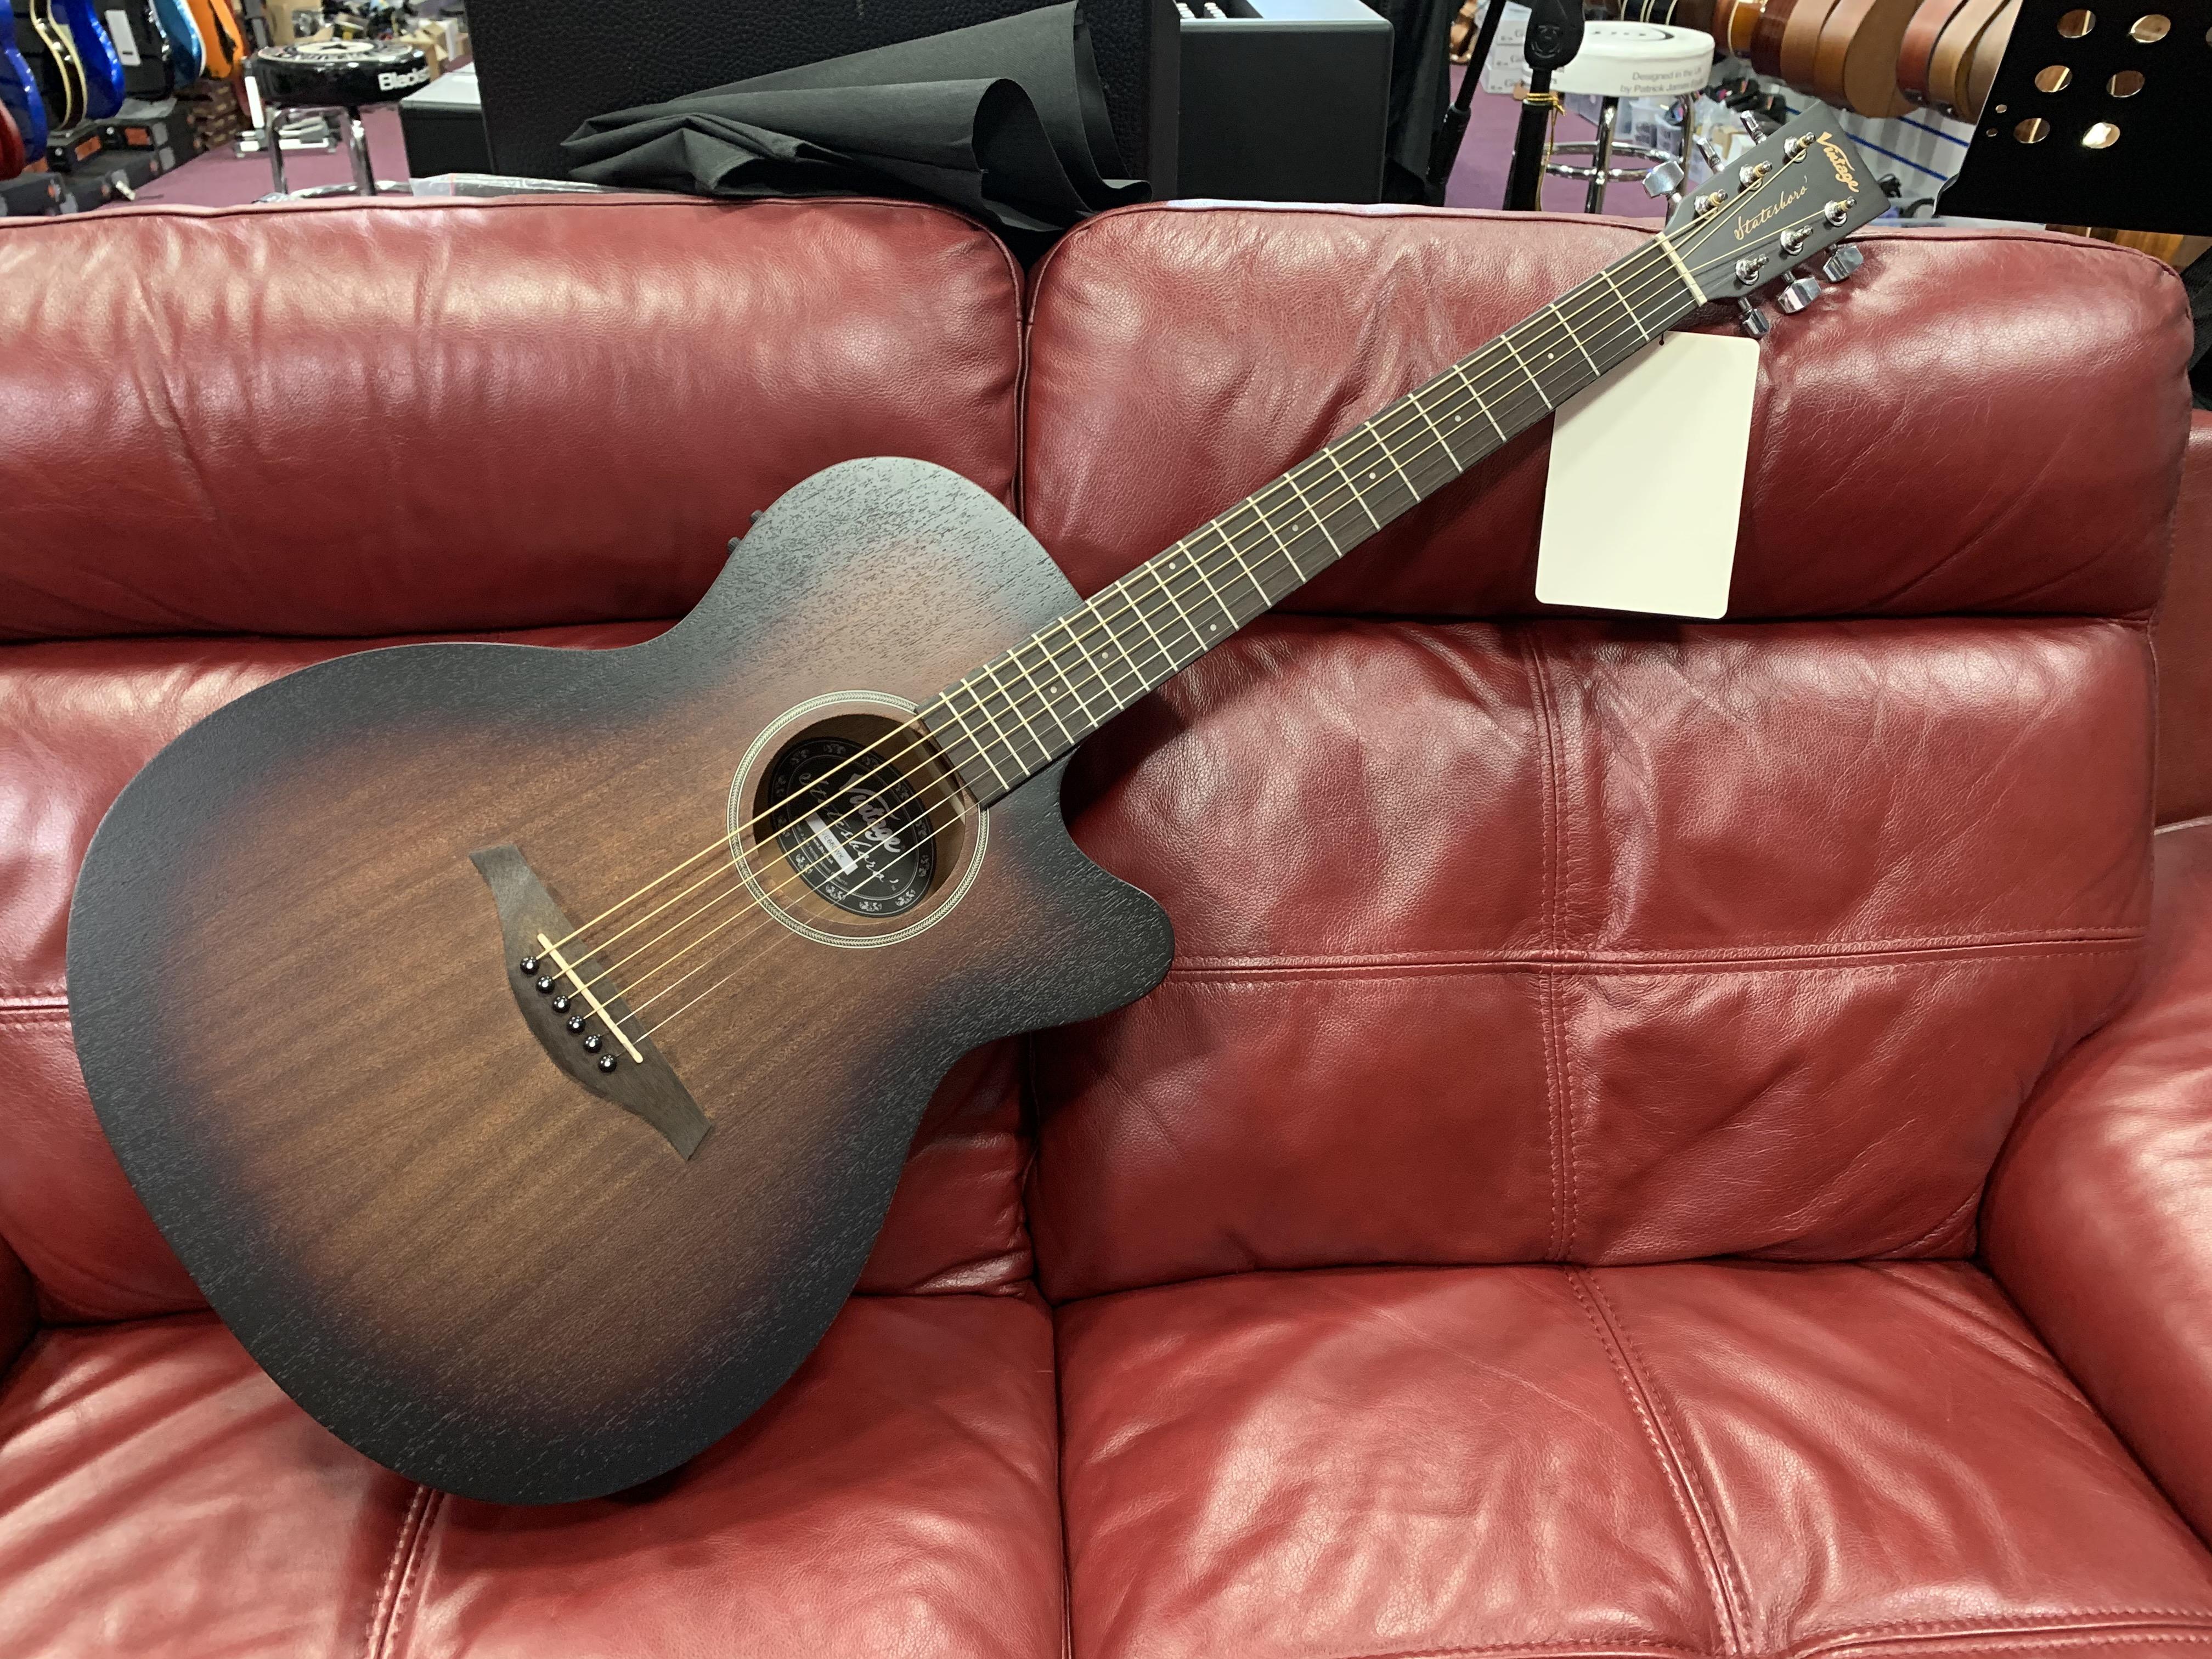 Vintage Statesboro VE660WK Cutaway Electro Acoustic Guitar (RRP £159)